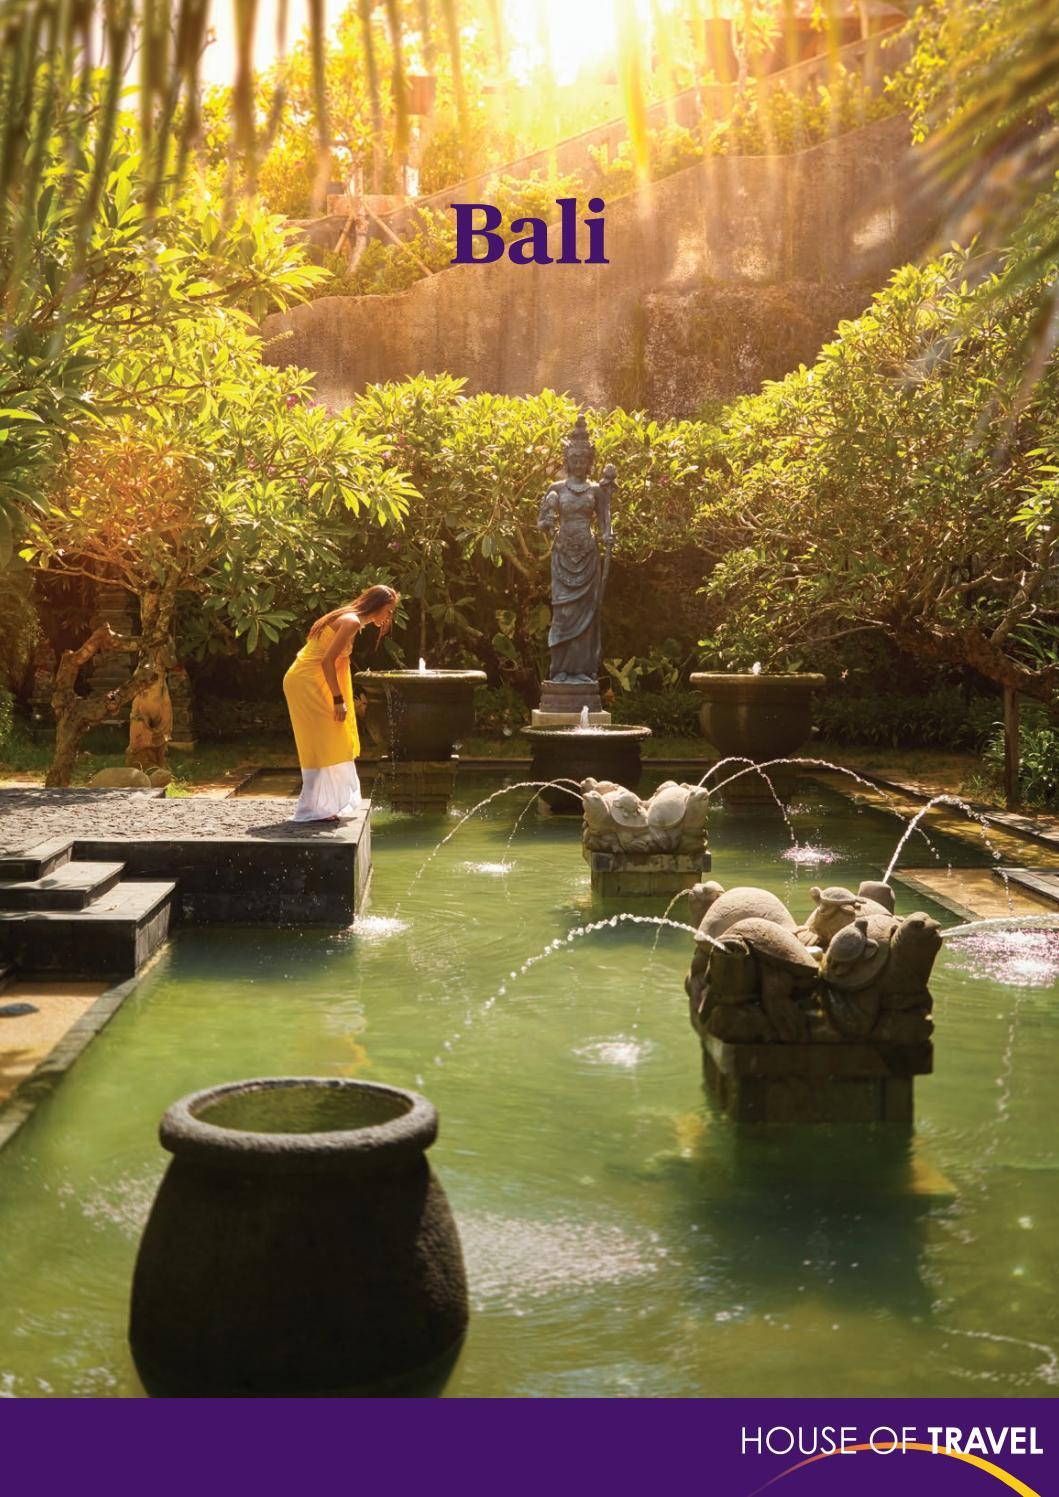 Bali Brochure 2017 By House Of Travel Issuu